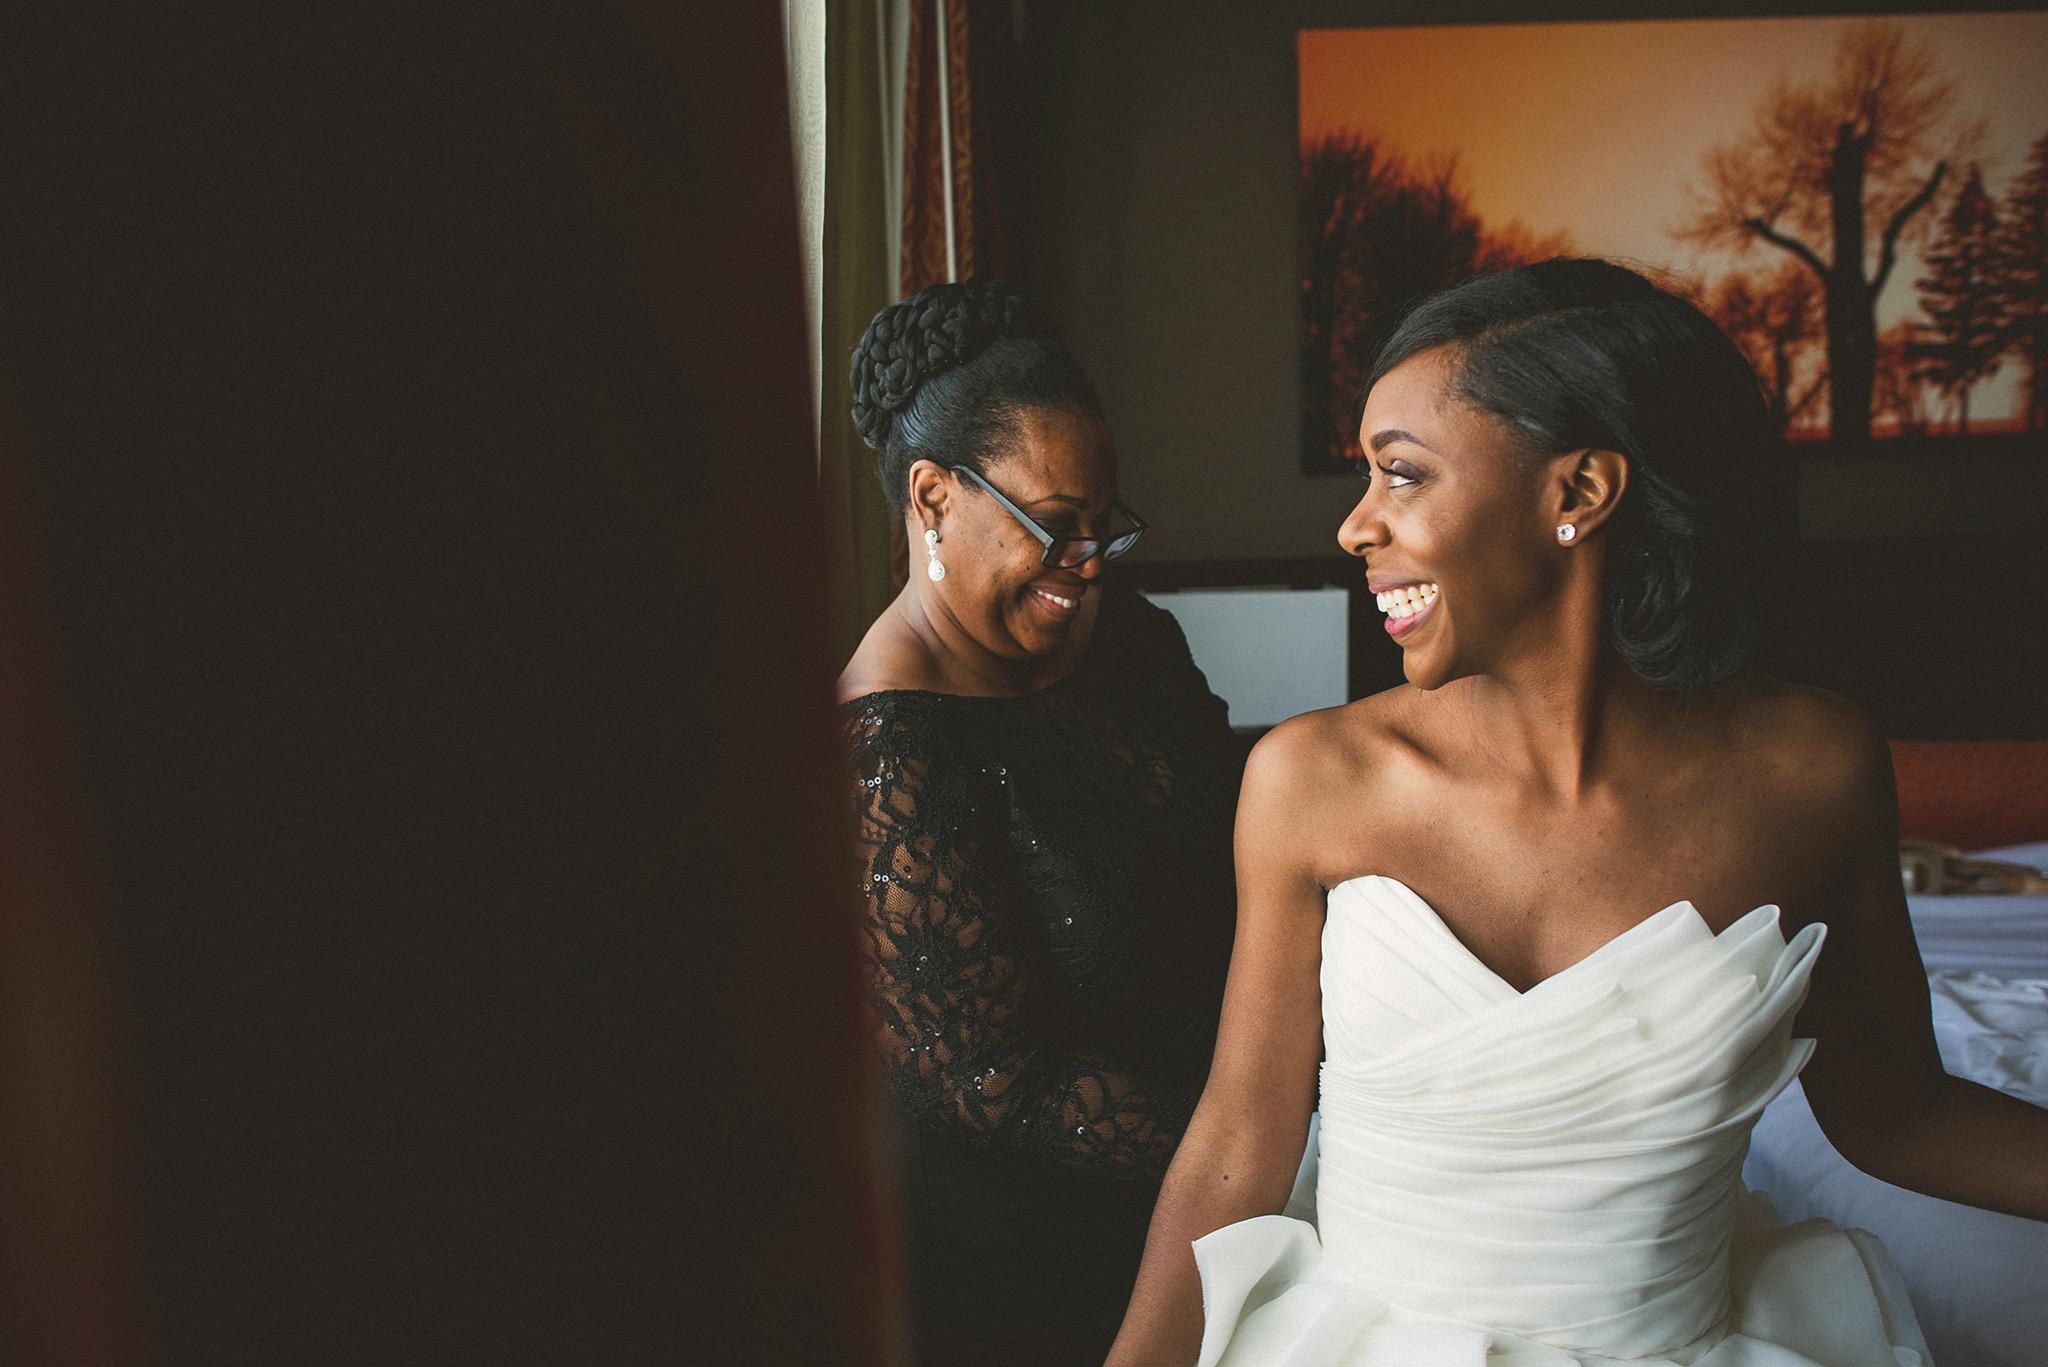 22-bride-candid.jpg